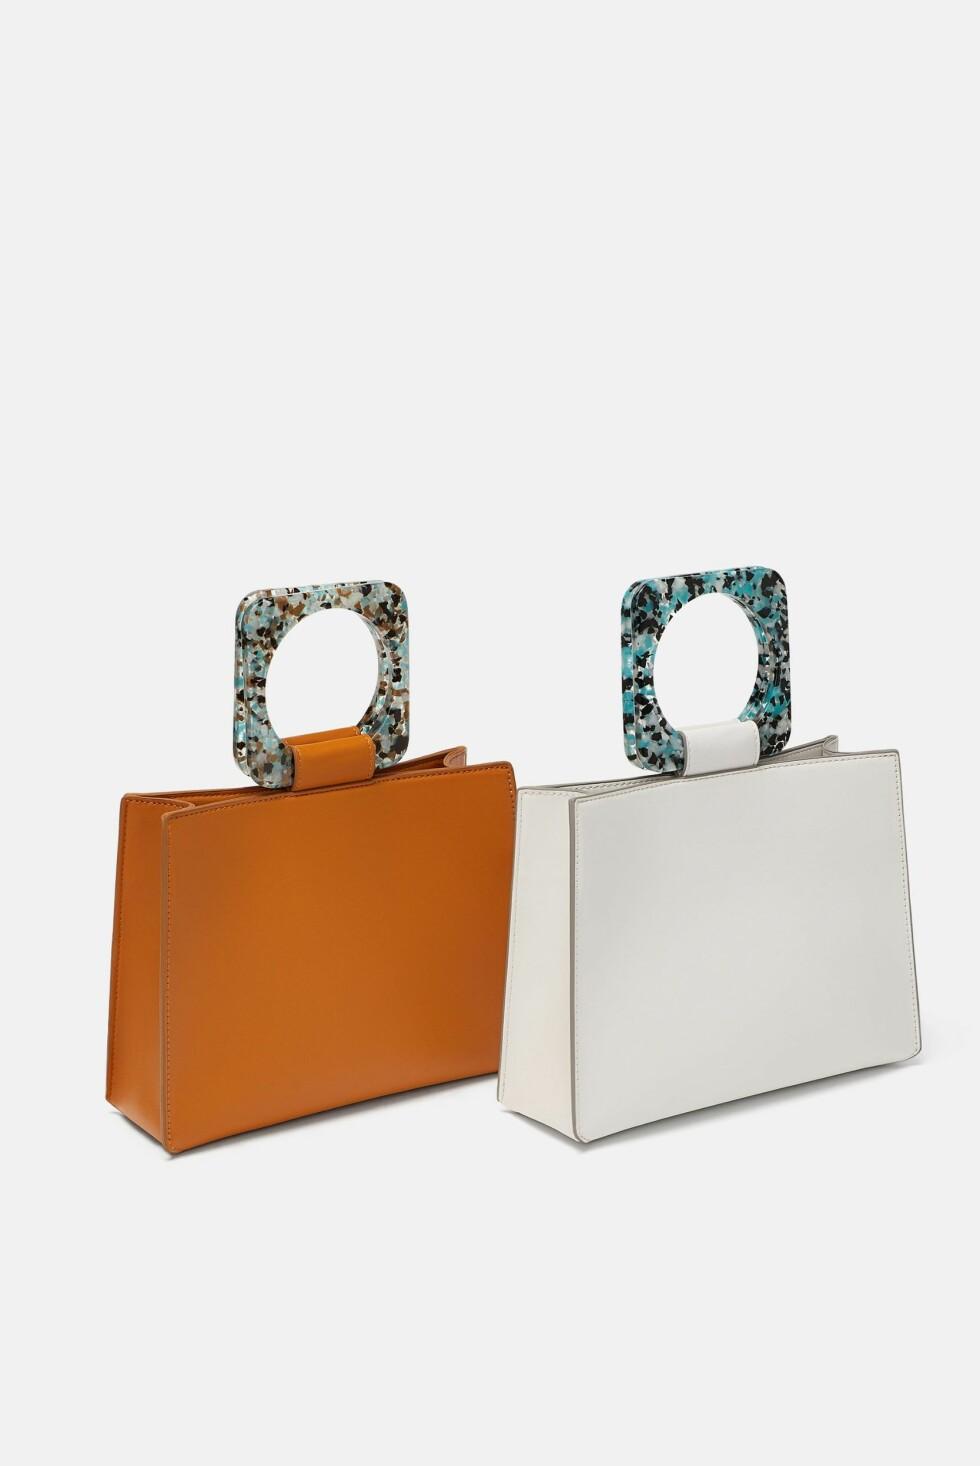 Veske fra Zara |350,-| https://www.zara.com/no/no/liten-shopper-med-h%C3%A5ndtak-p15392304.html?v1=6936574&v2=1074525